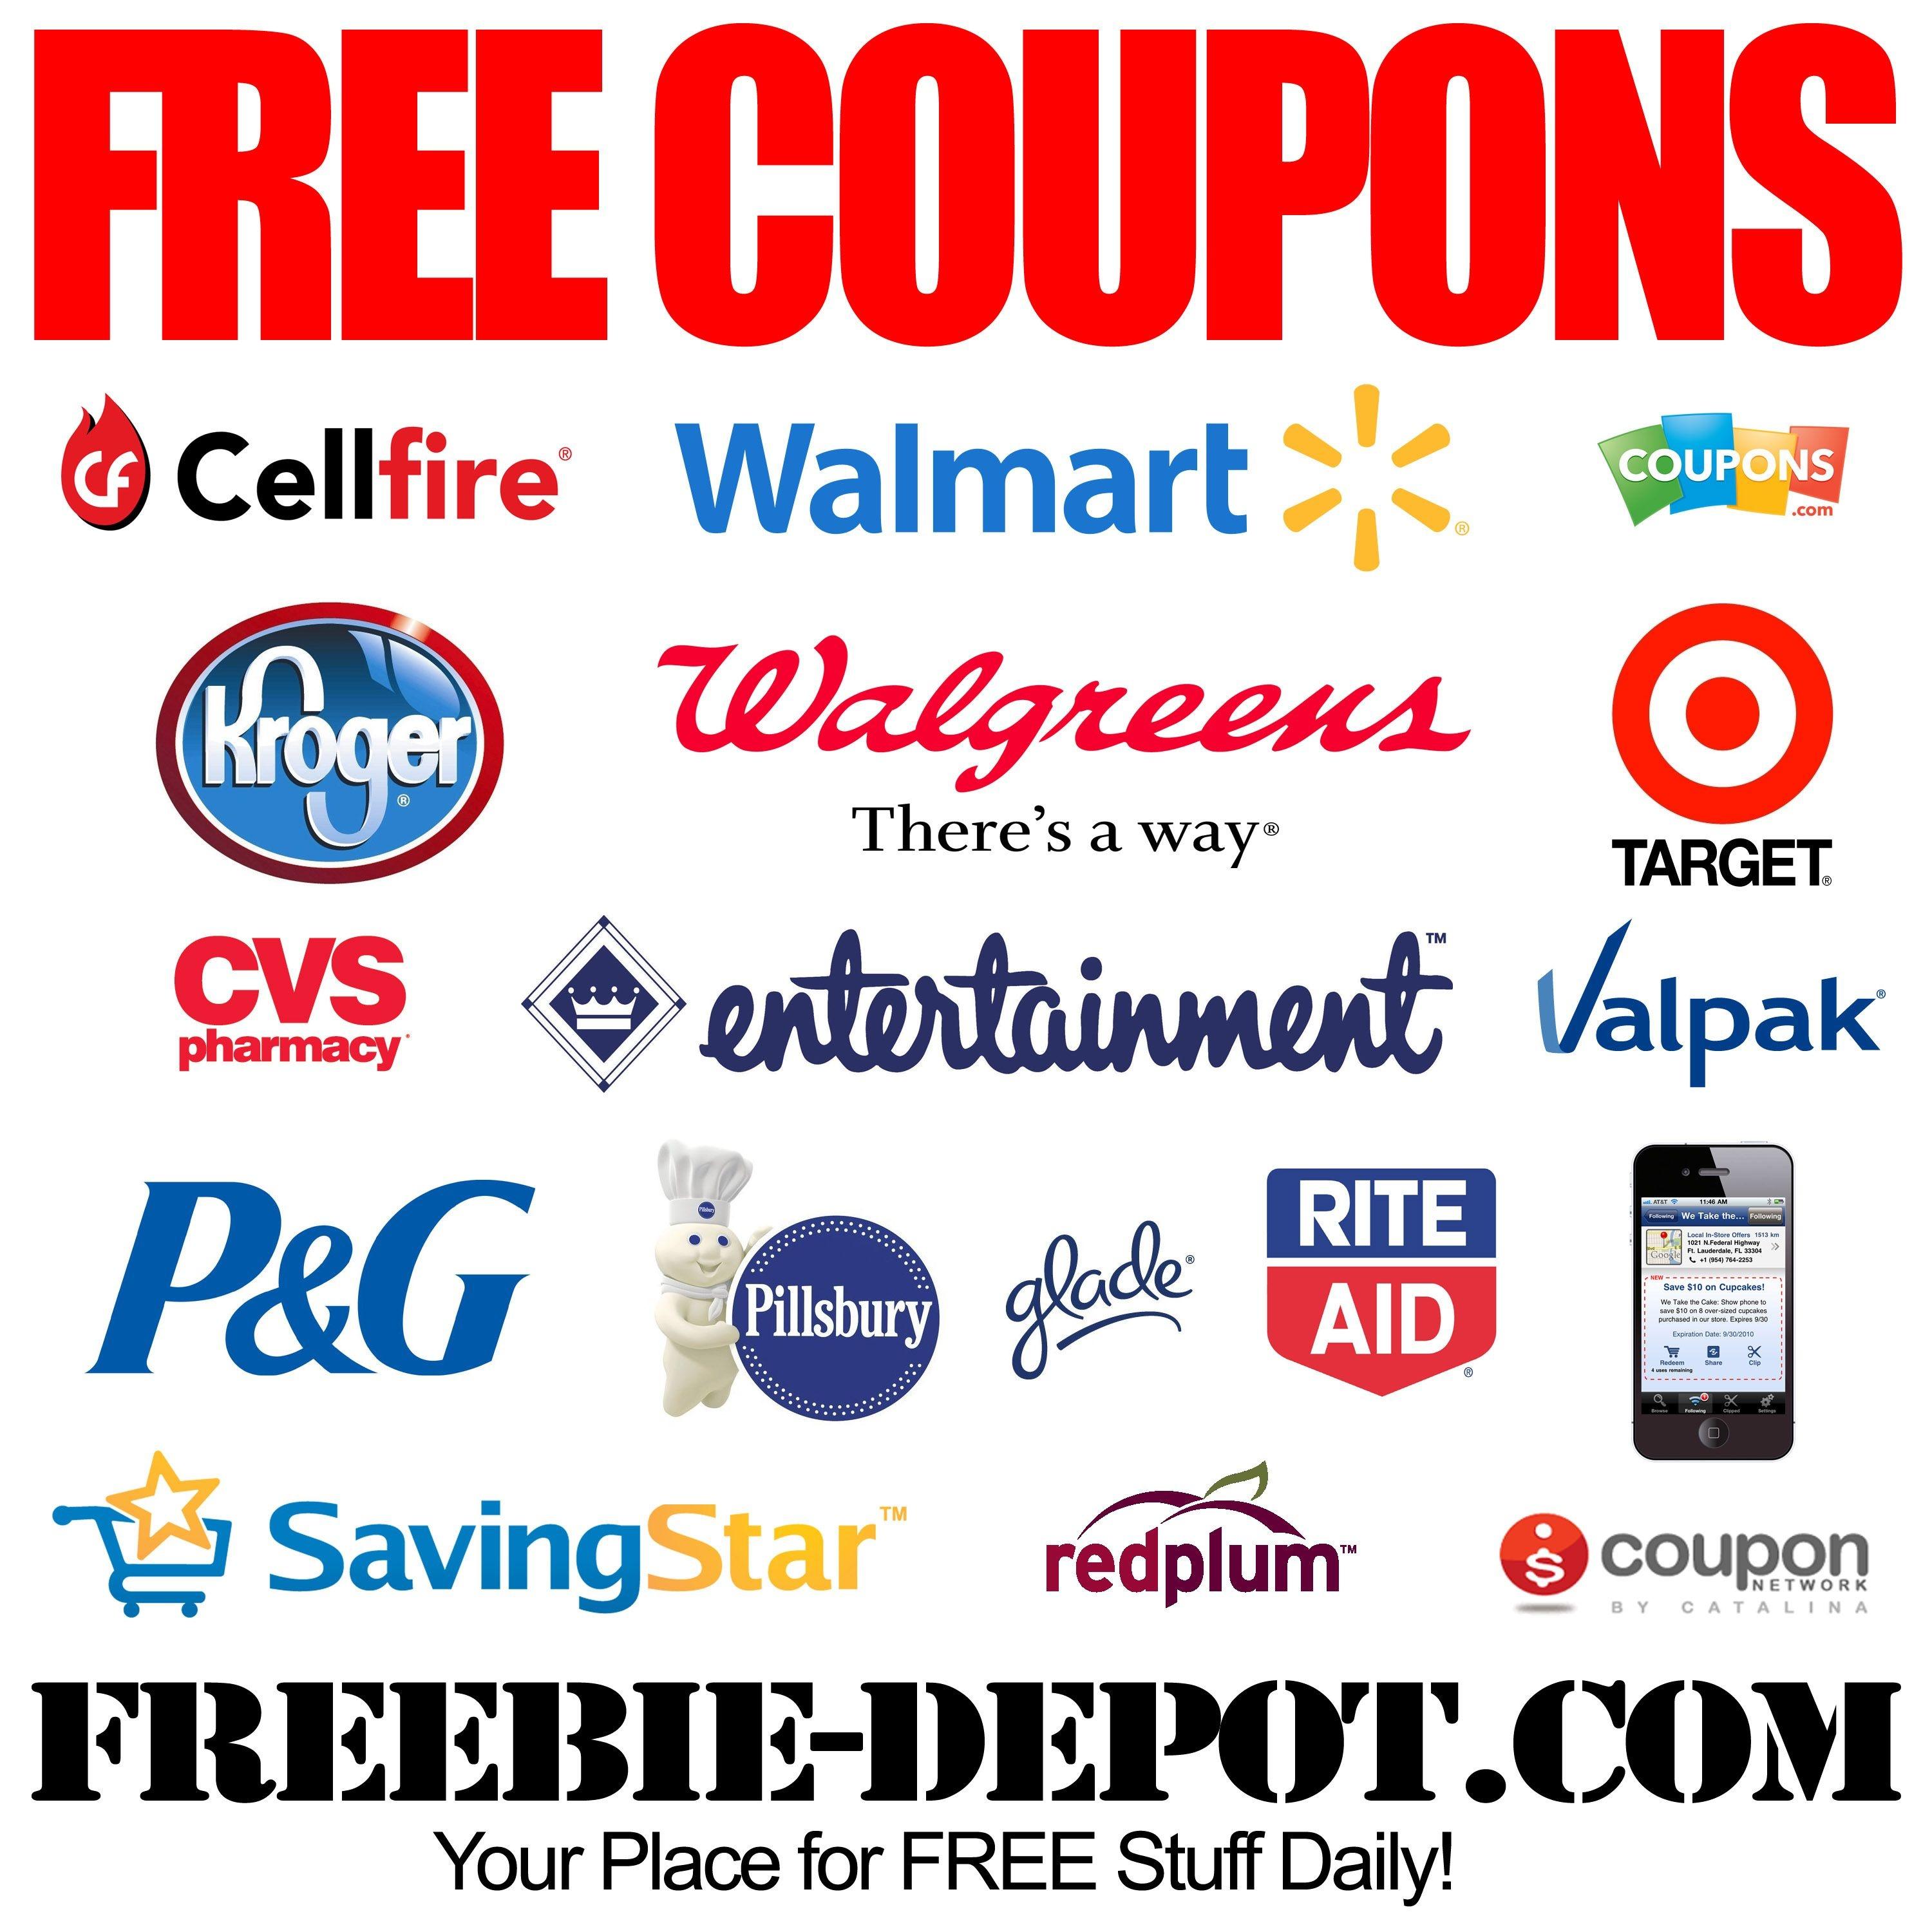 Free Coupons - Free Printable Coupons - Free Grocery Coupons - Free Printable Grocery Coupons